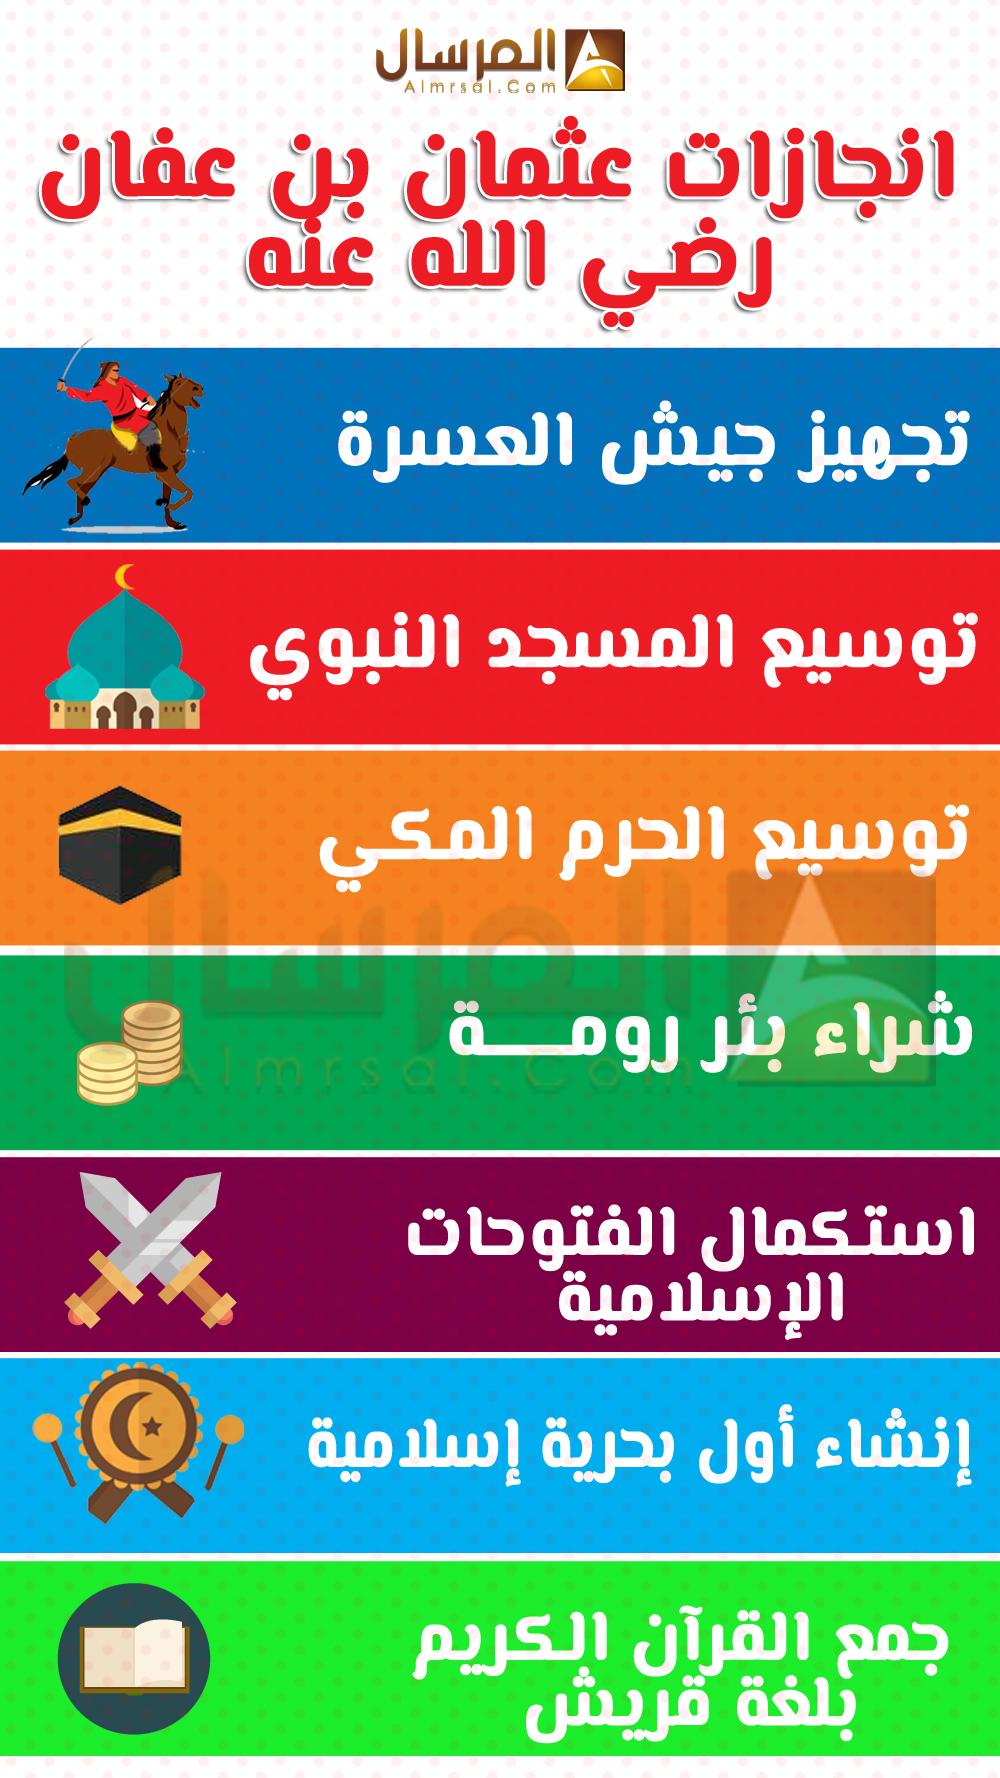 كتاب عثمان بن عفان